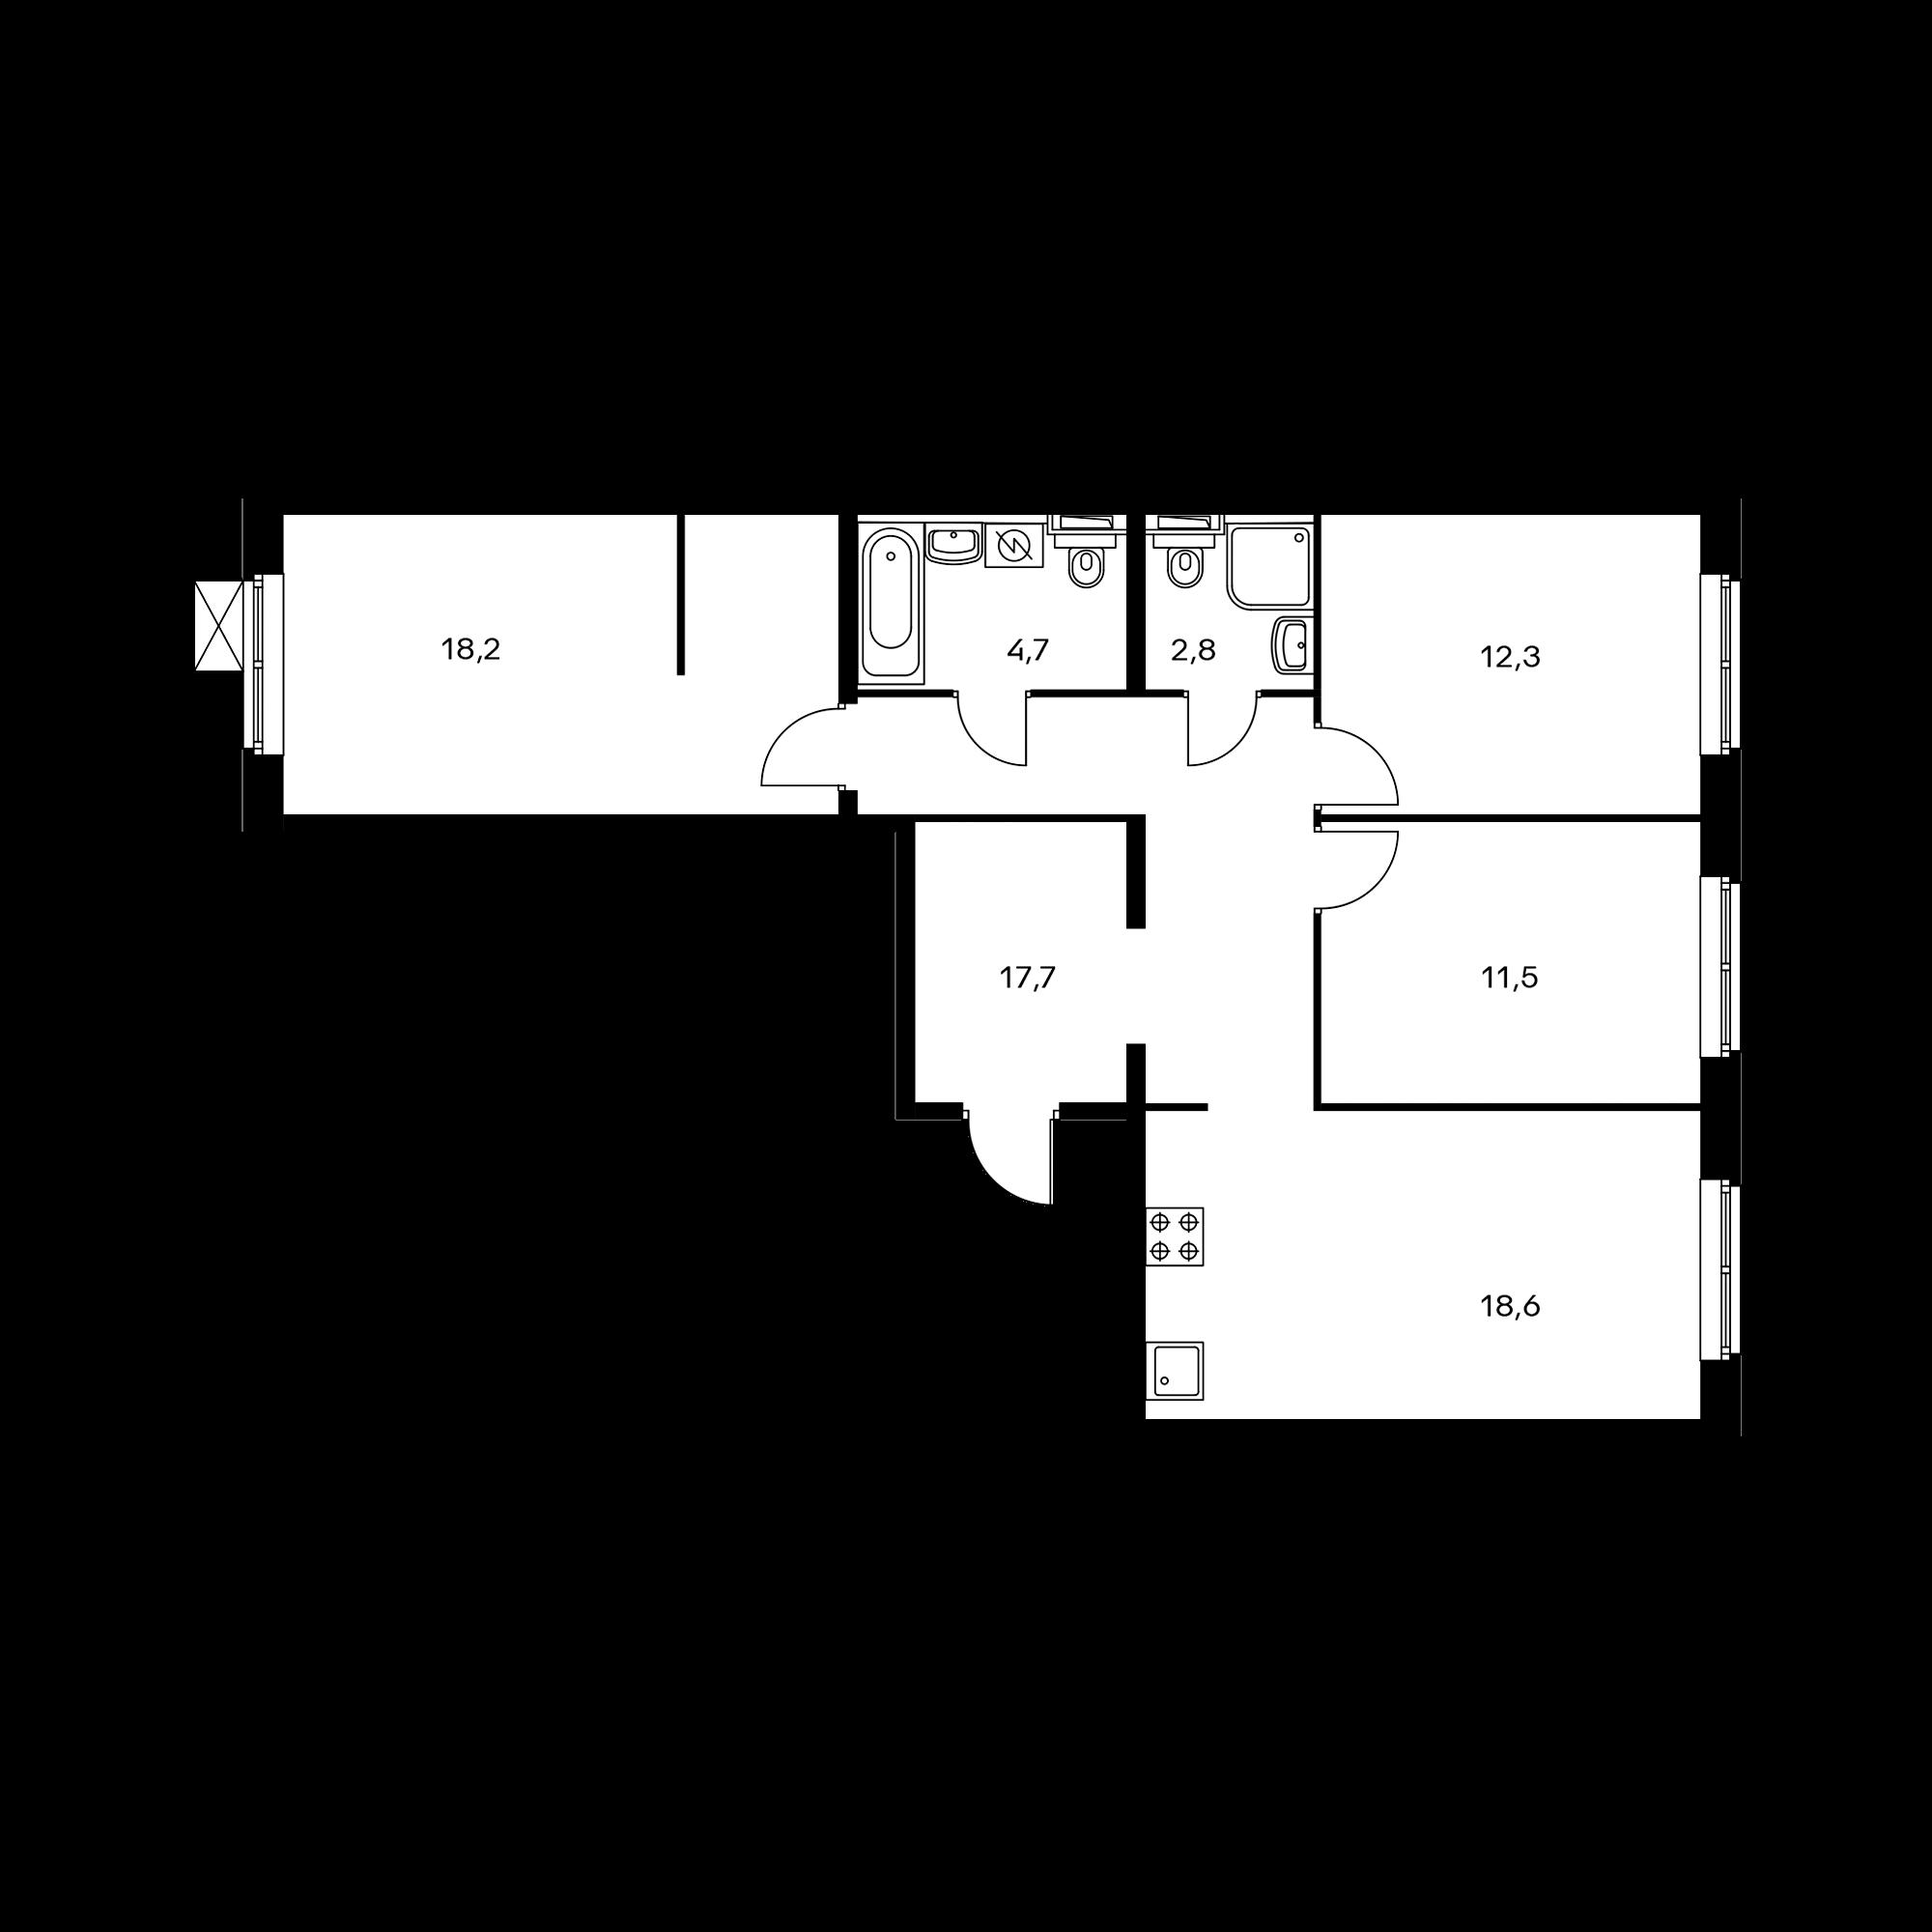 3EL3_9.6-1